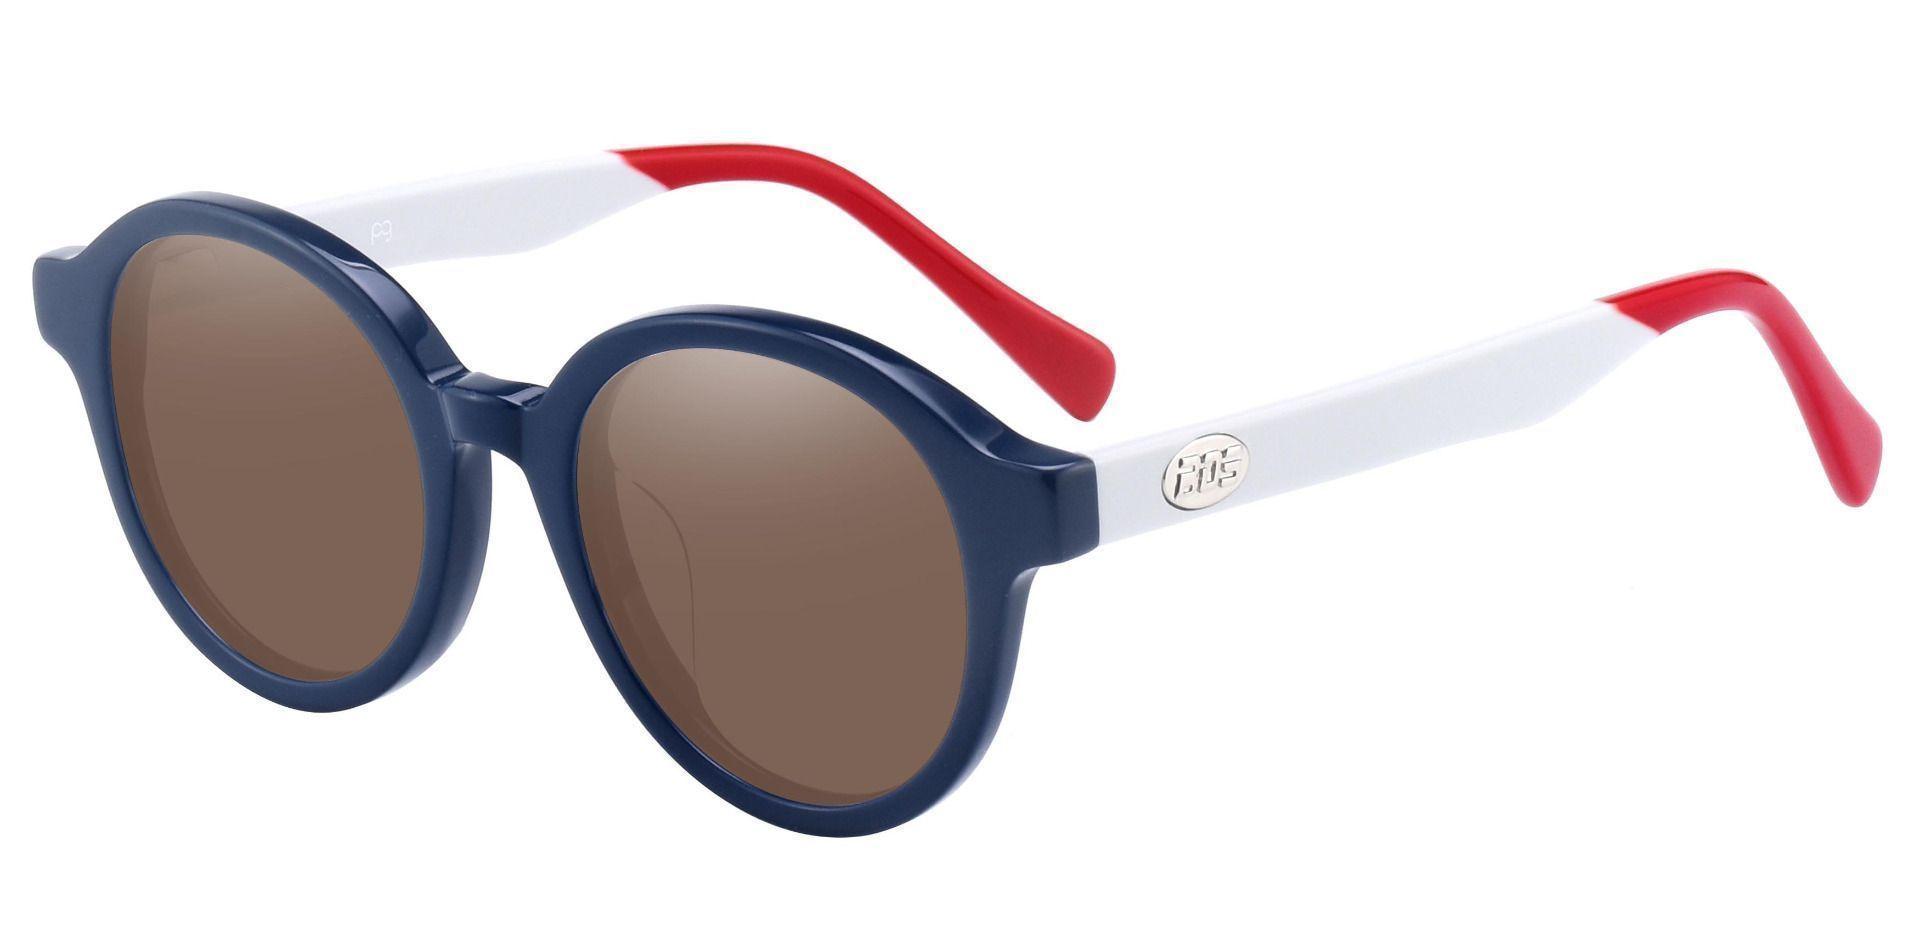 Roxbury Round Progressive Sunglasses - Blue Frame With Brown Lenses